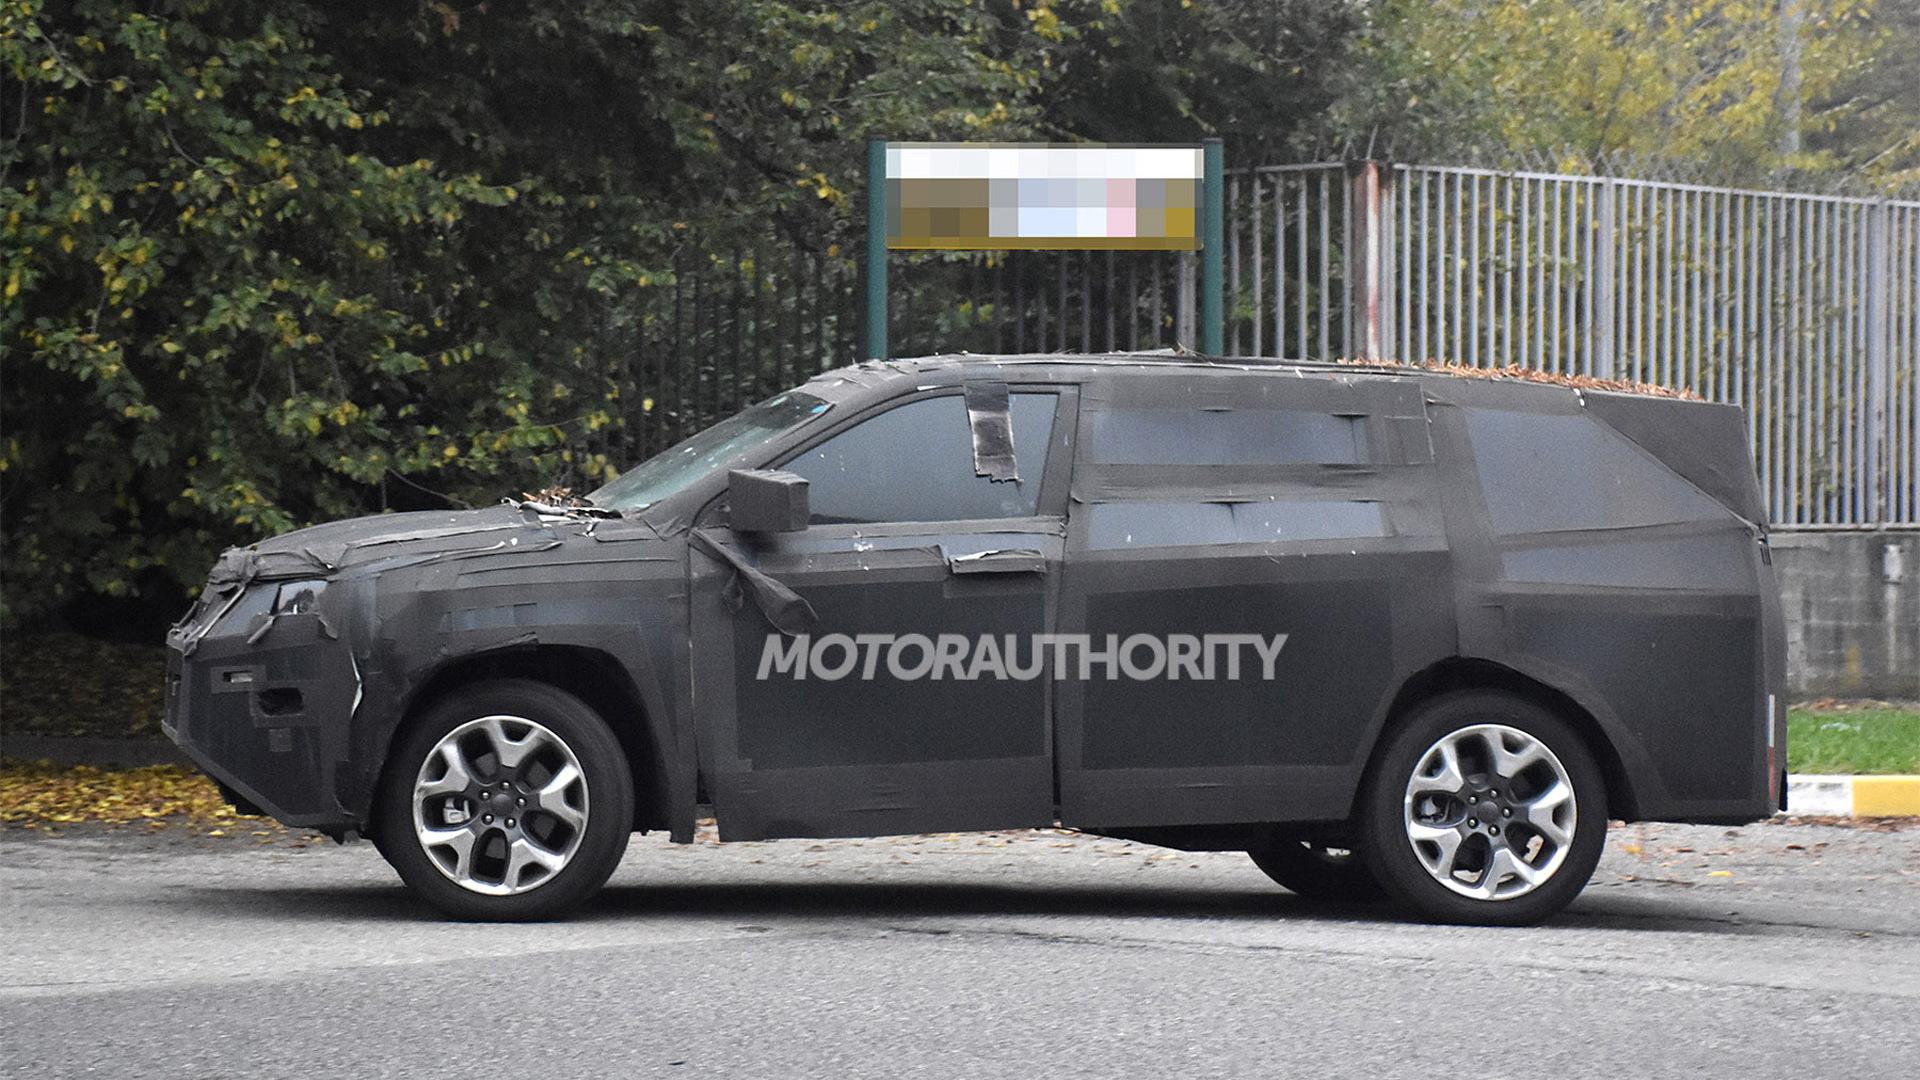 2022 Jeep Compass-based three-row SUV spy shots - Photo credit:S. Baldauf/SB-Medien